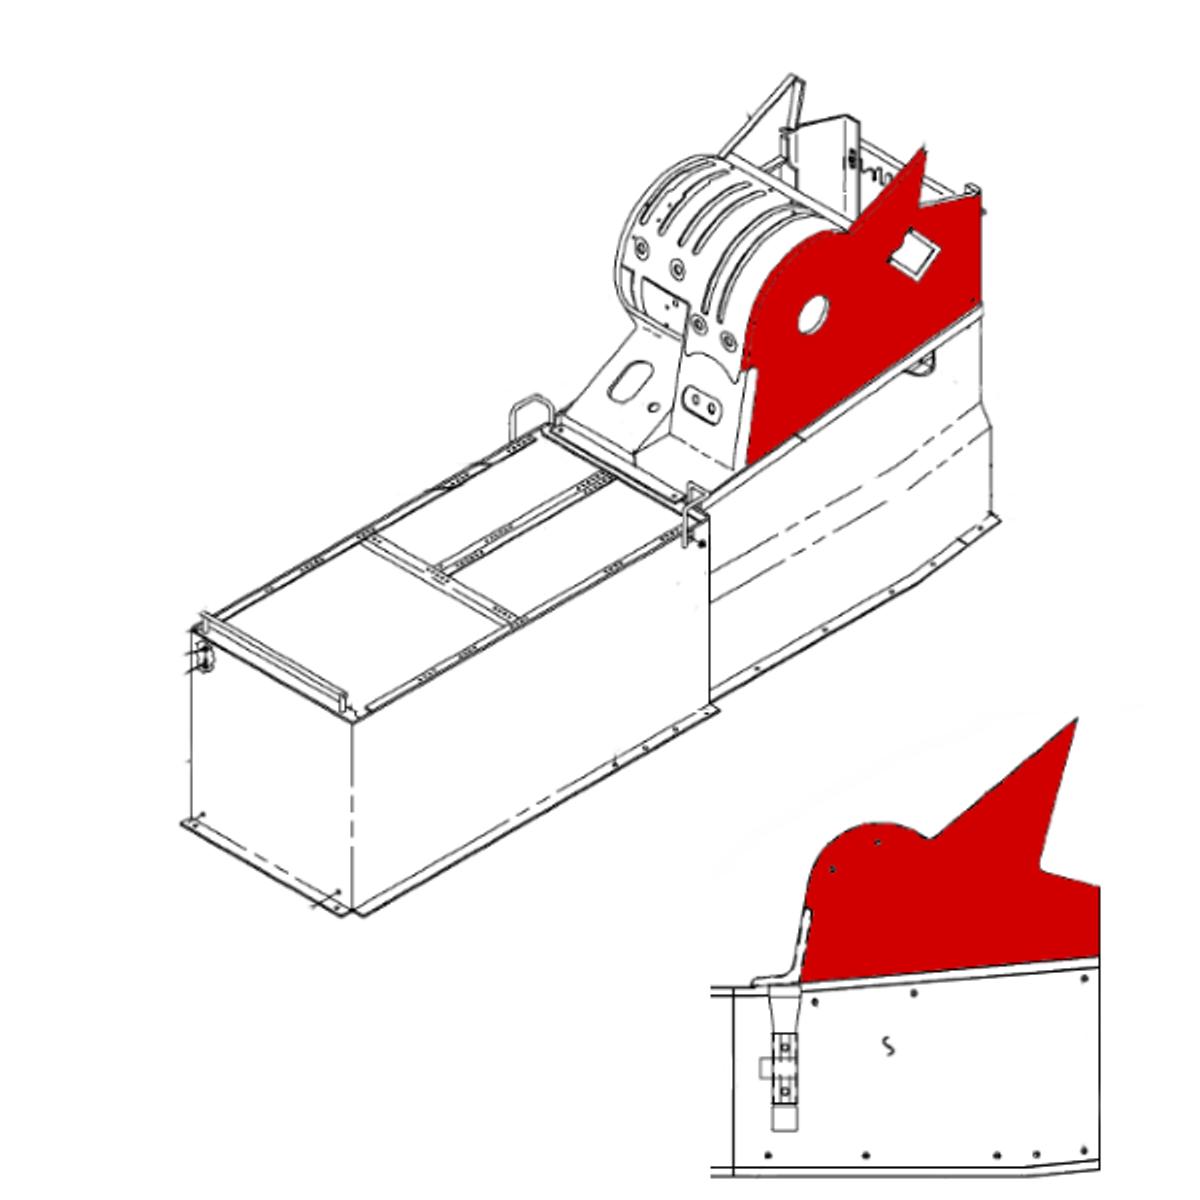 Panel Assy Upper LH/RH, Beechcraft 1900D, Part  114-530227-1, 114-530227-3